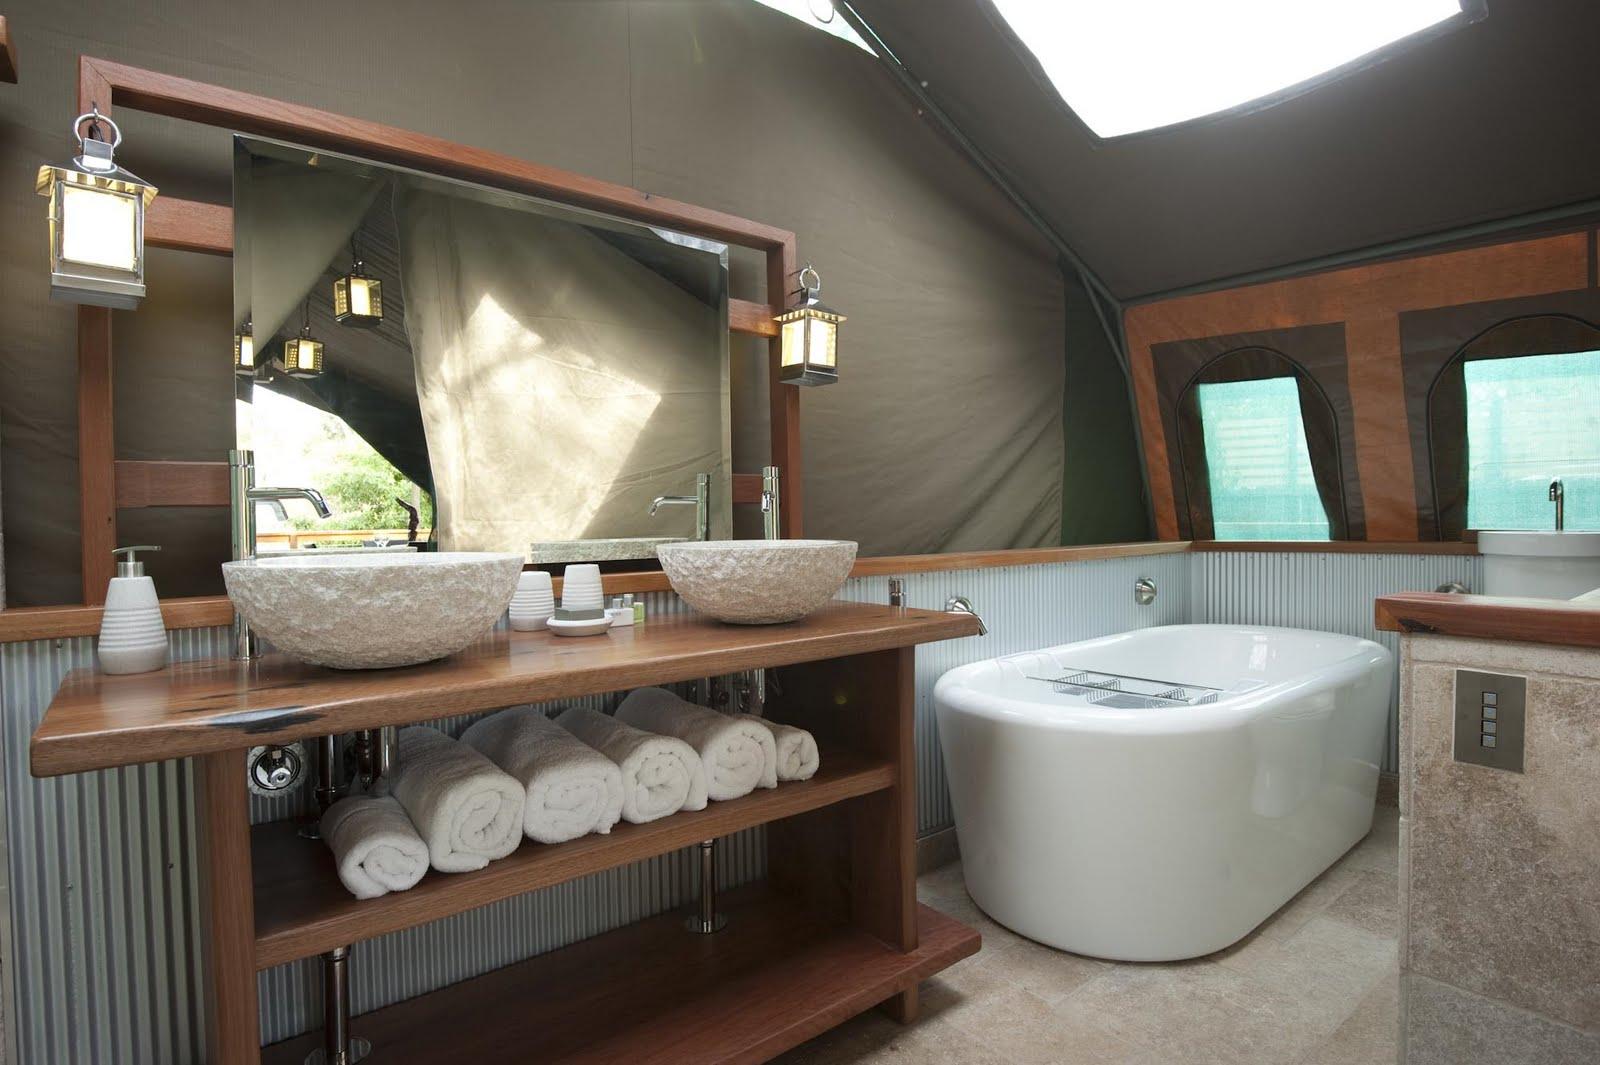 yurt | Travelling Content\'s Blog